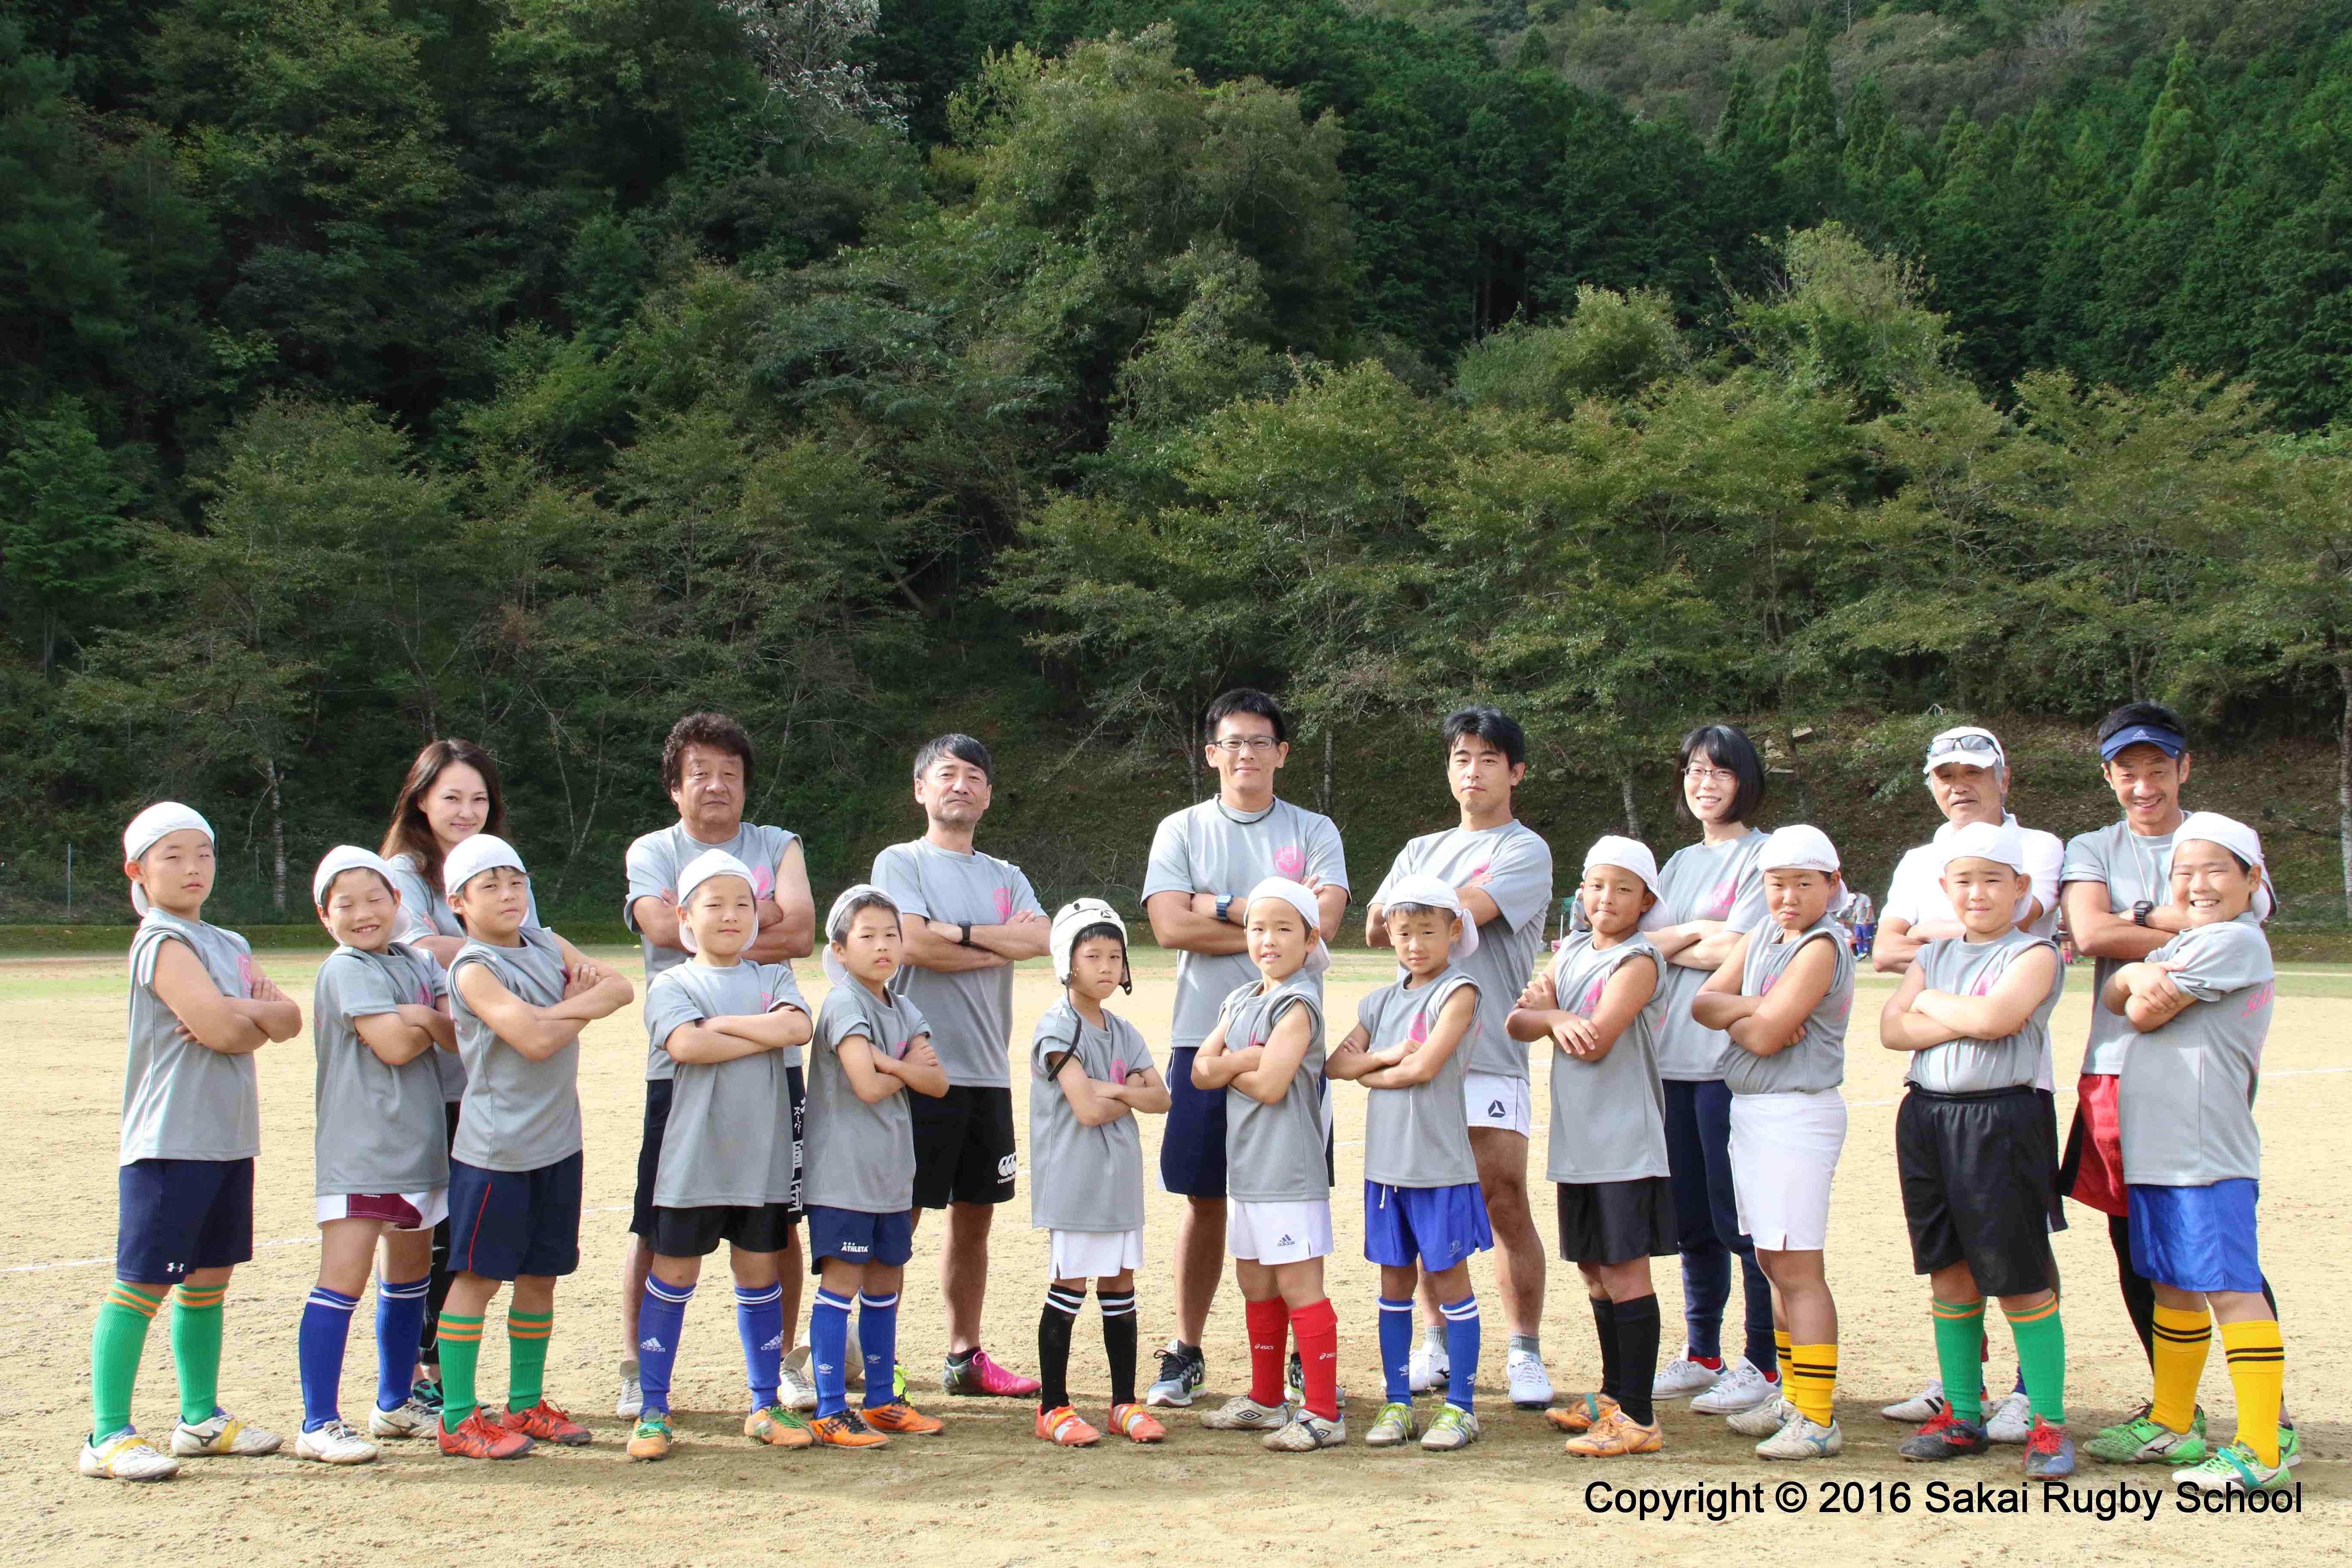 2016-10-10_gasshuku_7853_resize